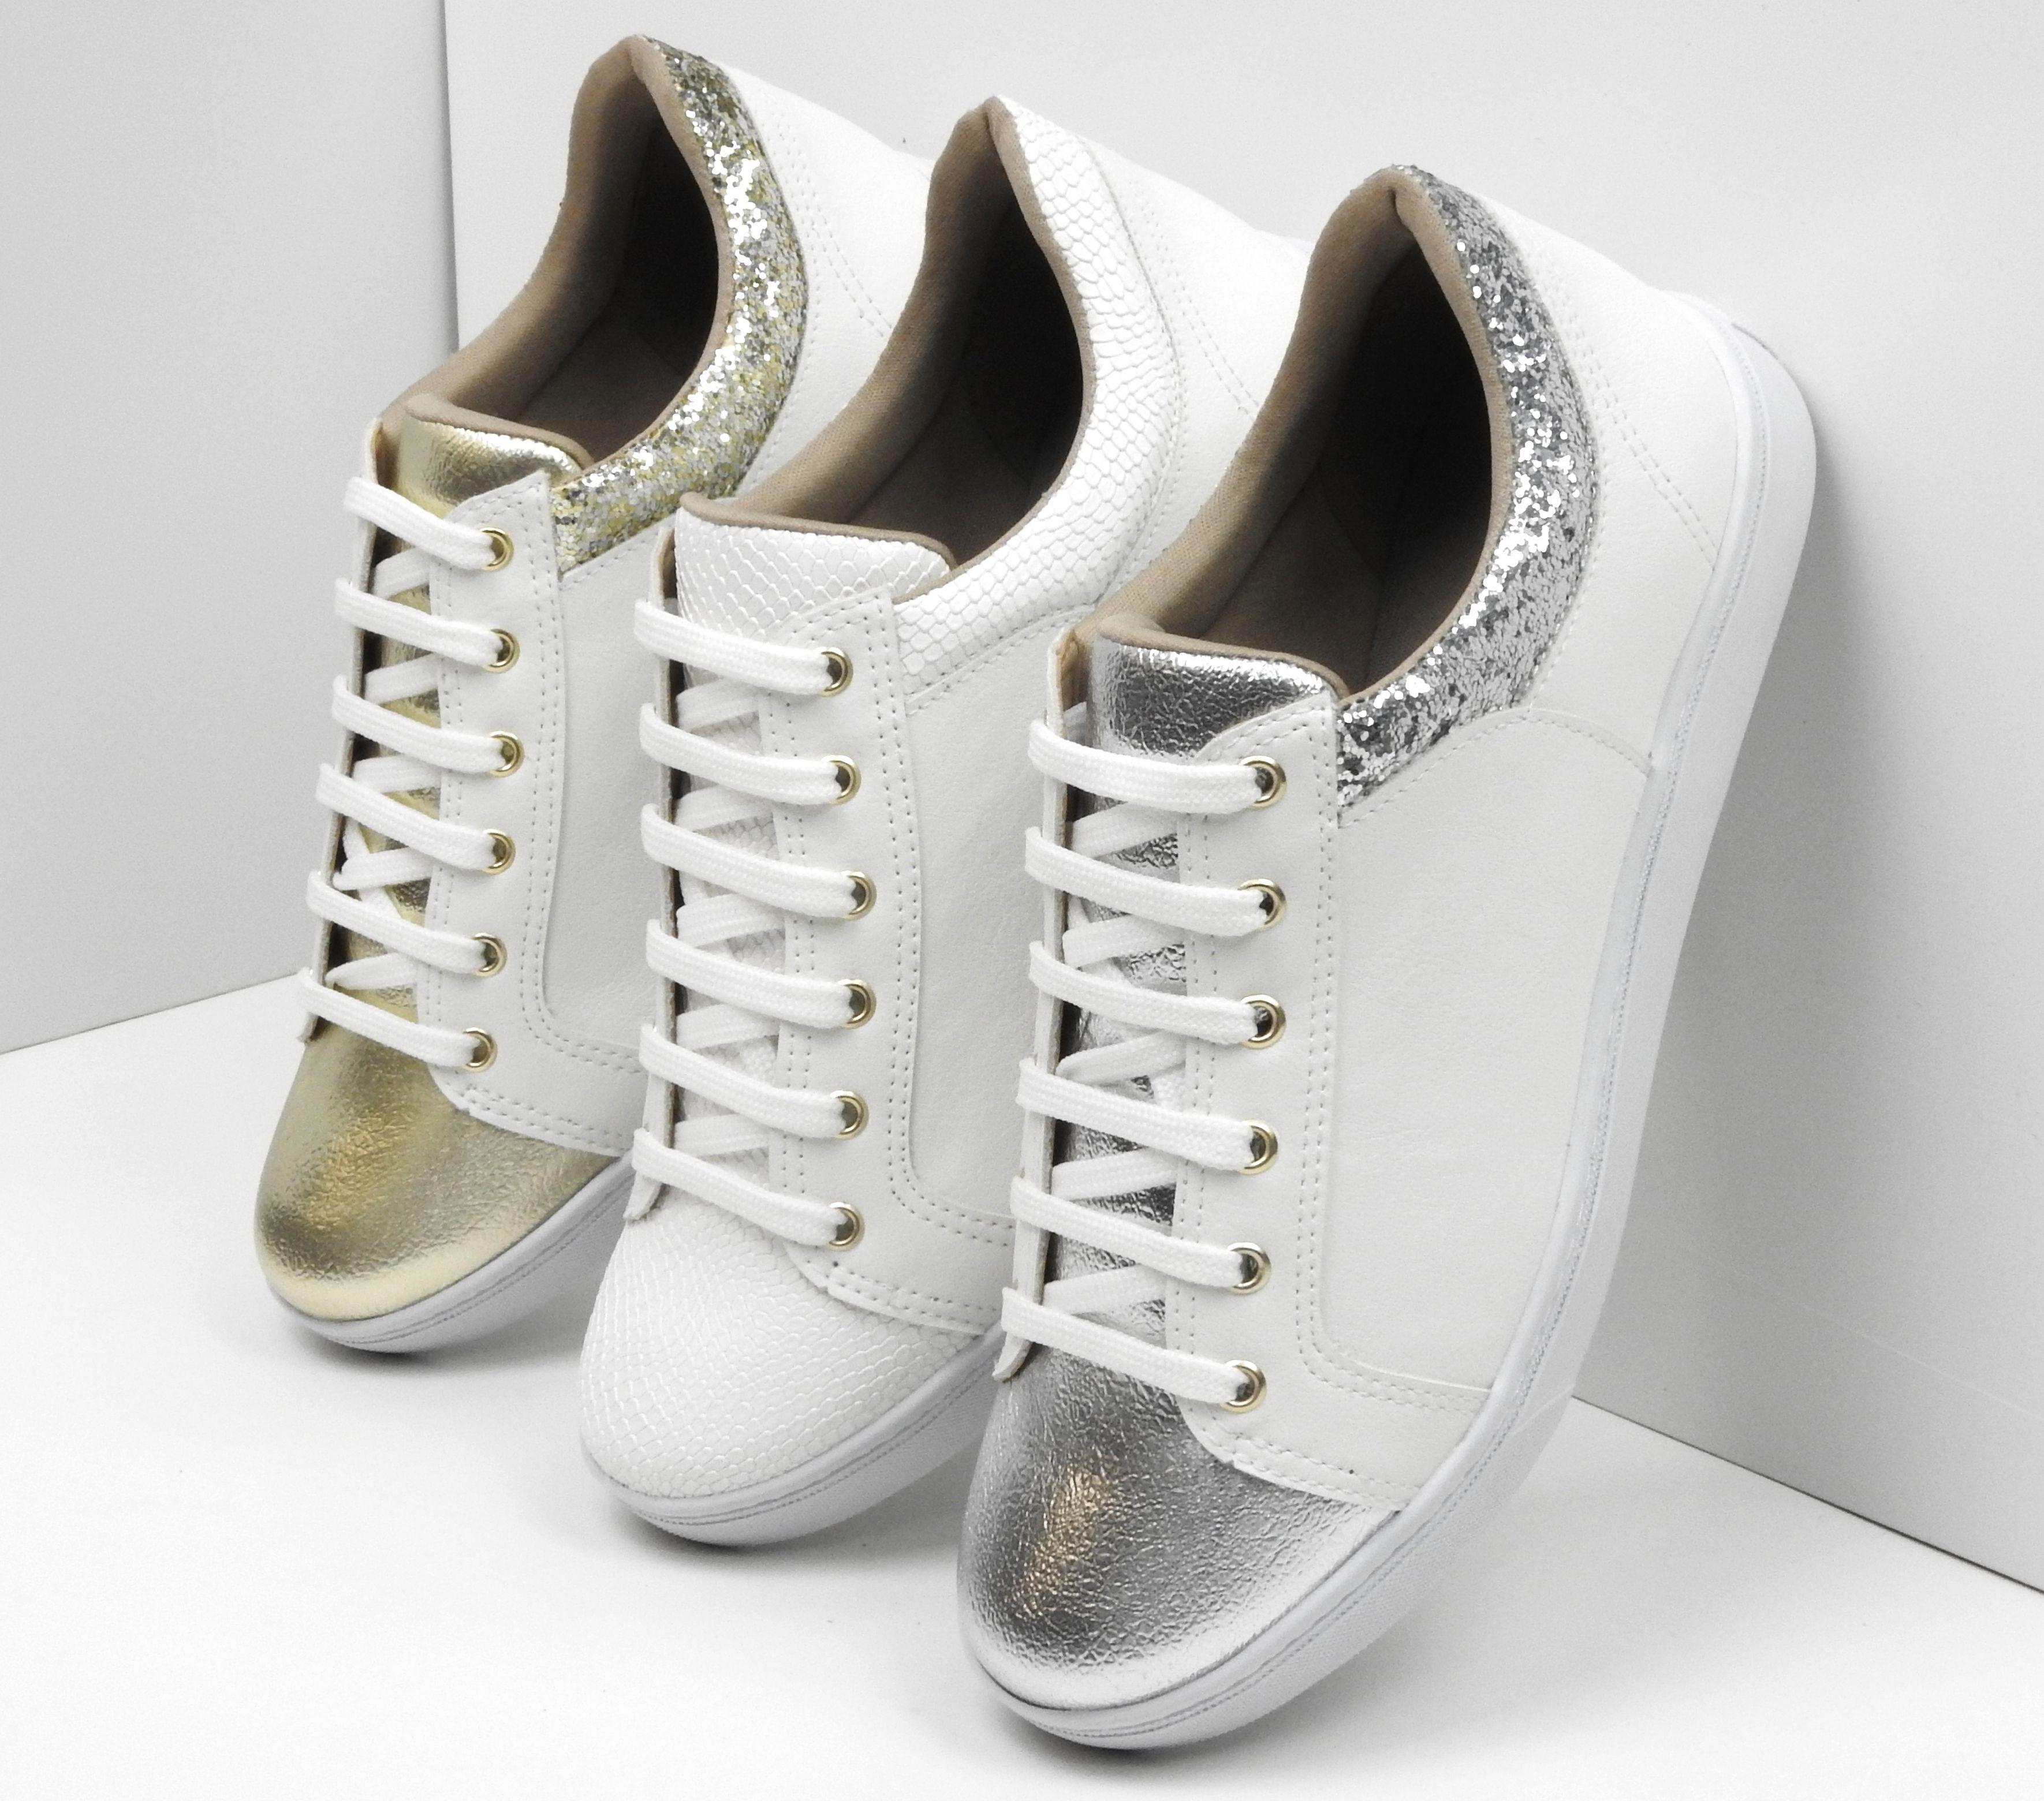 c48b9545ecb6f tênis - tendência - trend - sneaker - new in Ref. 16-12406   TÊNIS ...